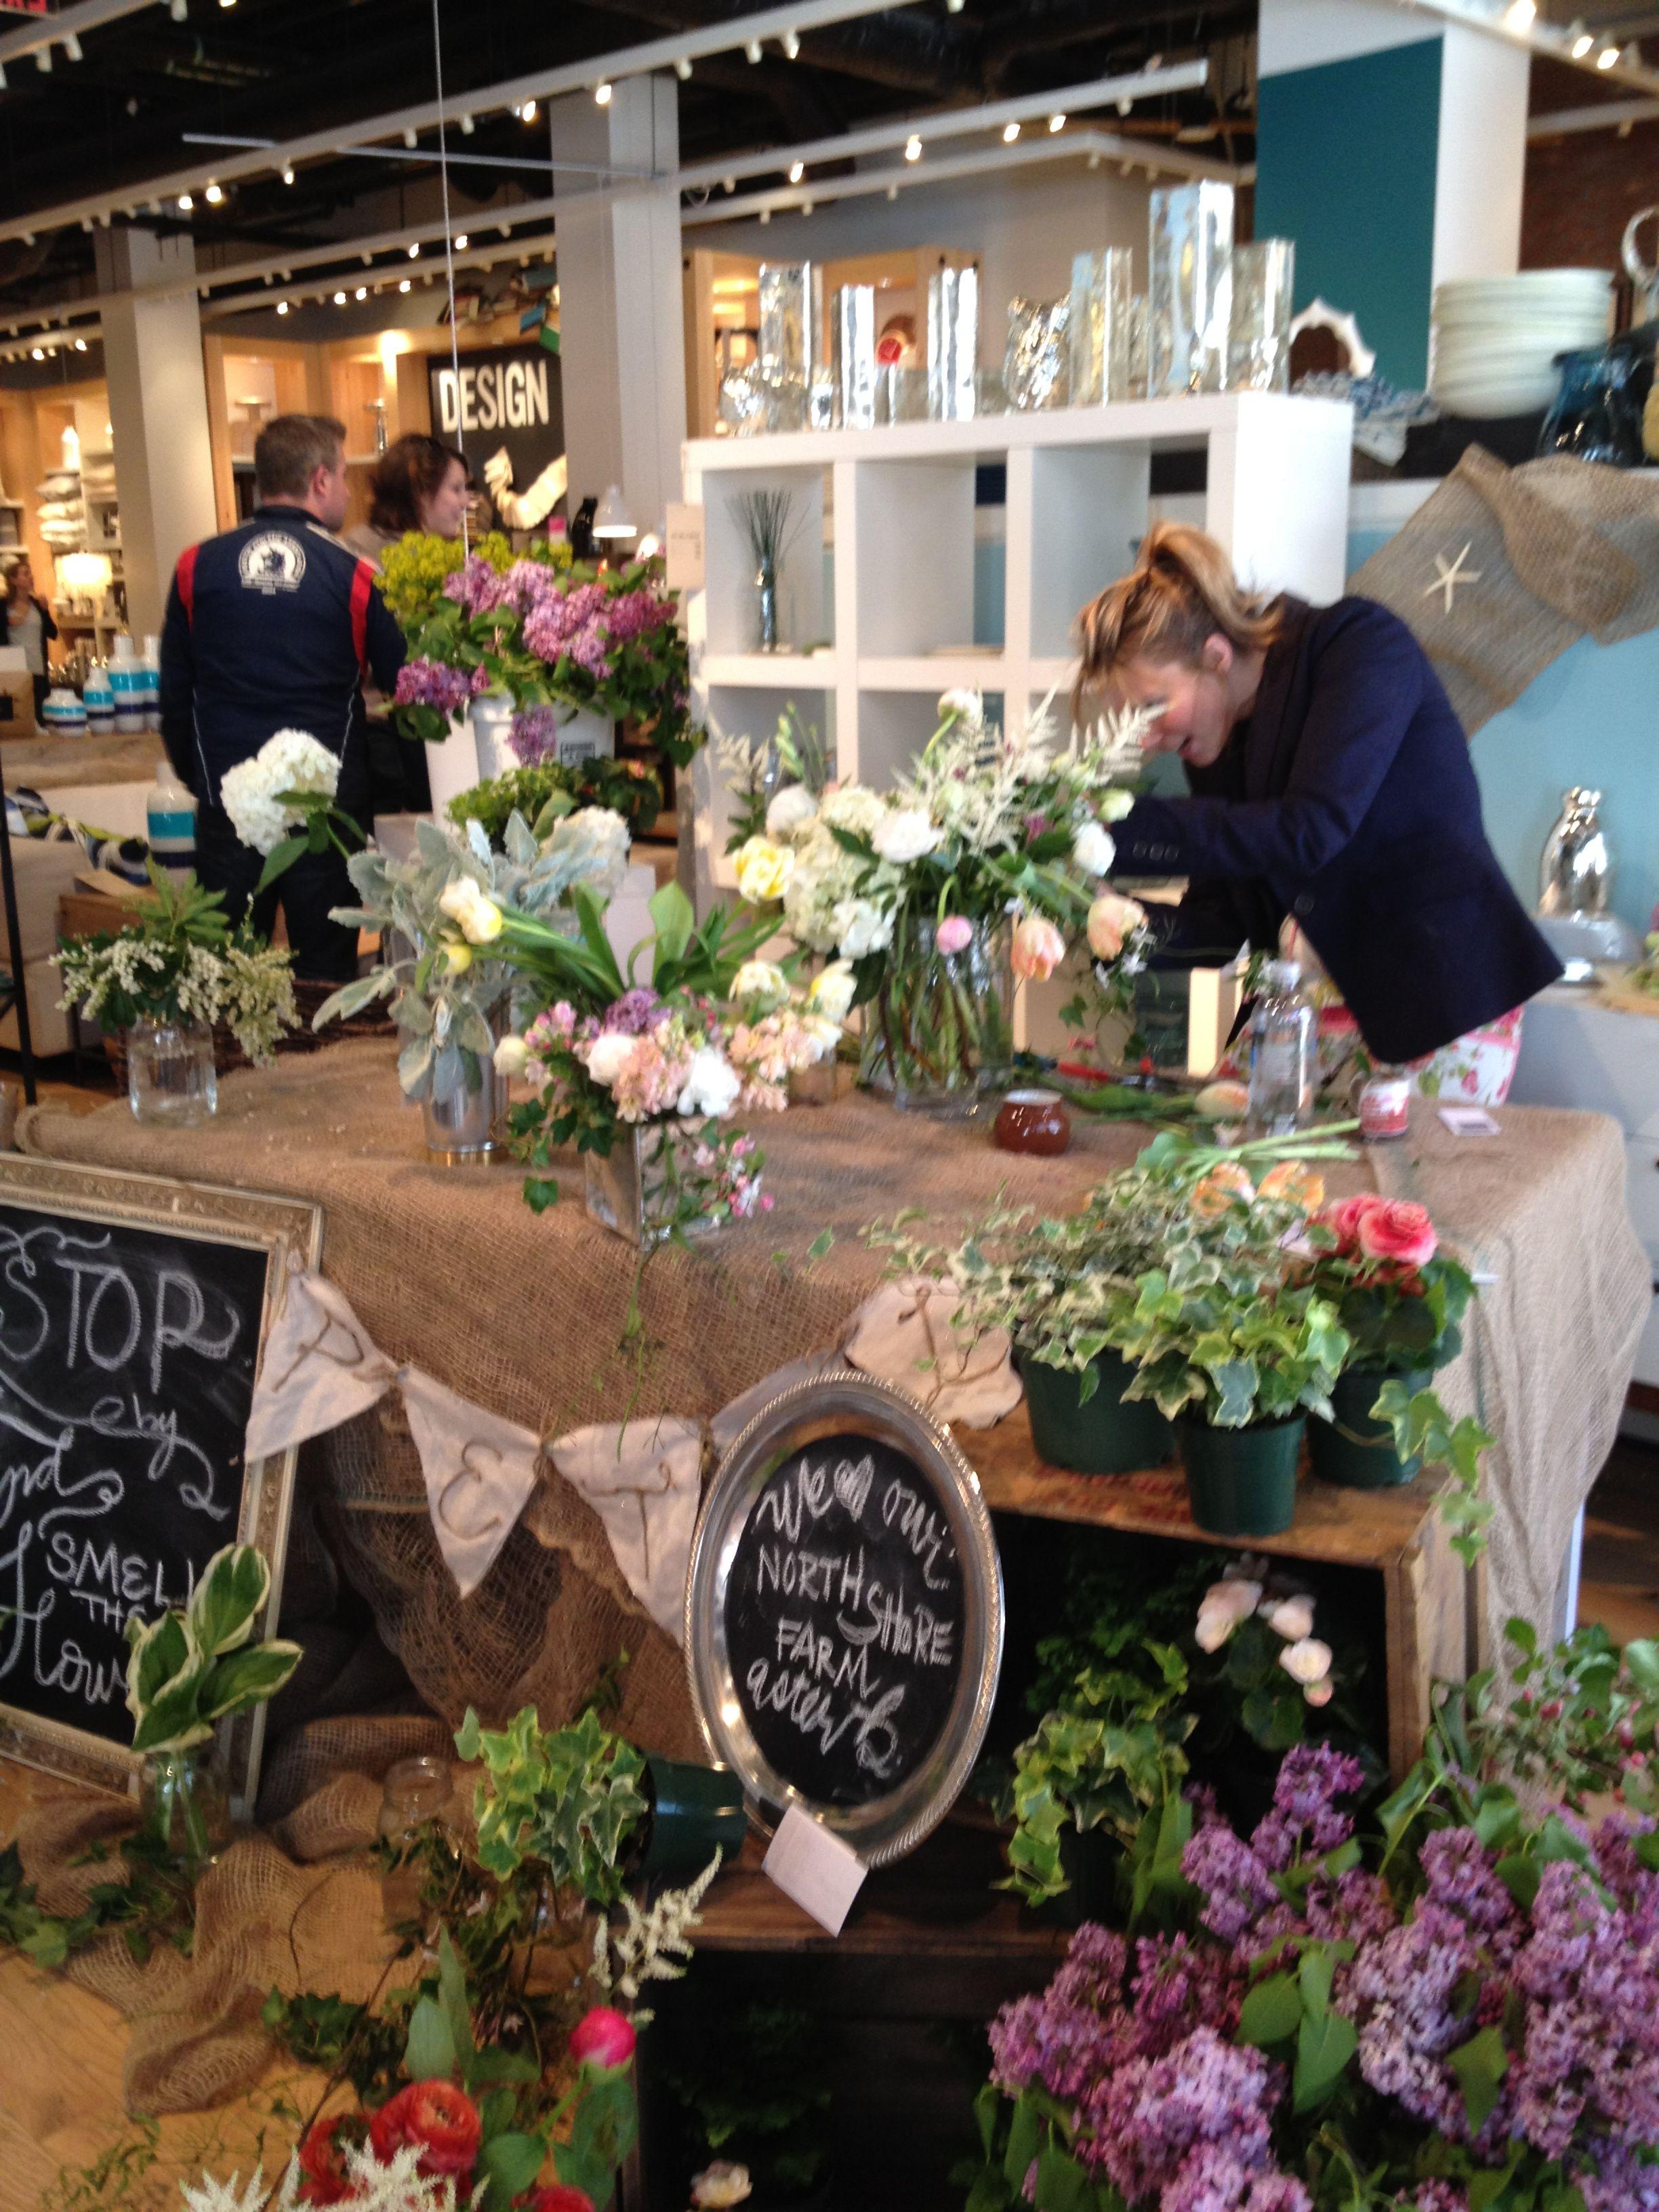 flower pop up shop ᘡղlvbᘡ༺ ☾♡ ♥ ♫ Lalala Bonne vie